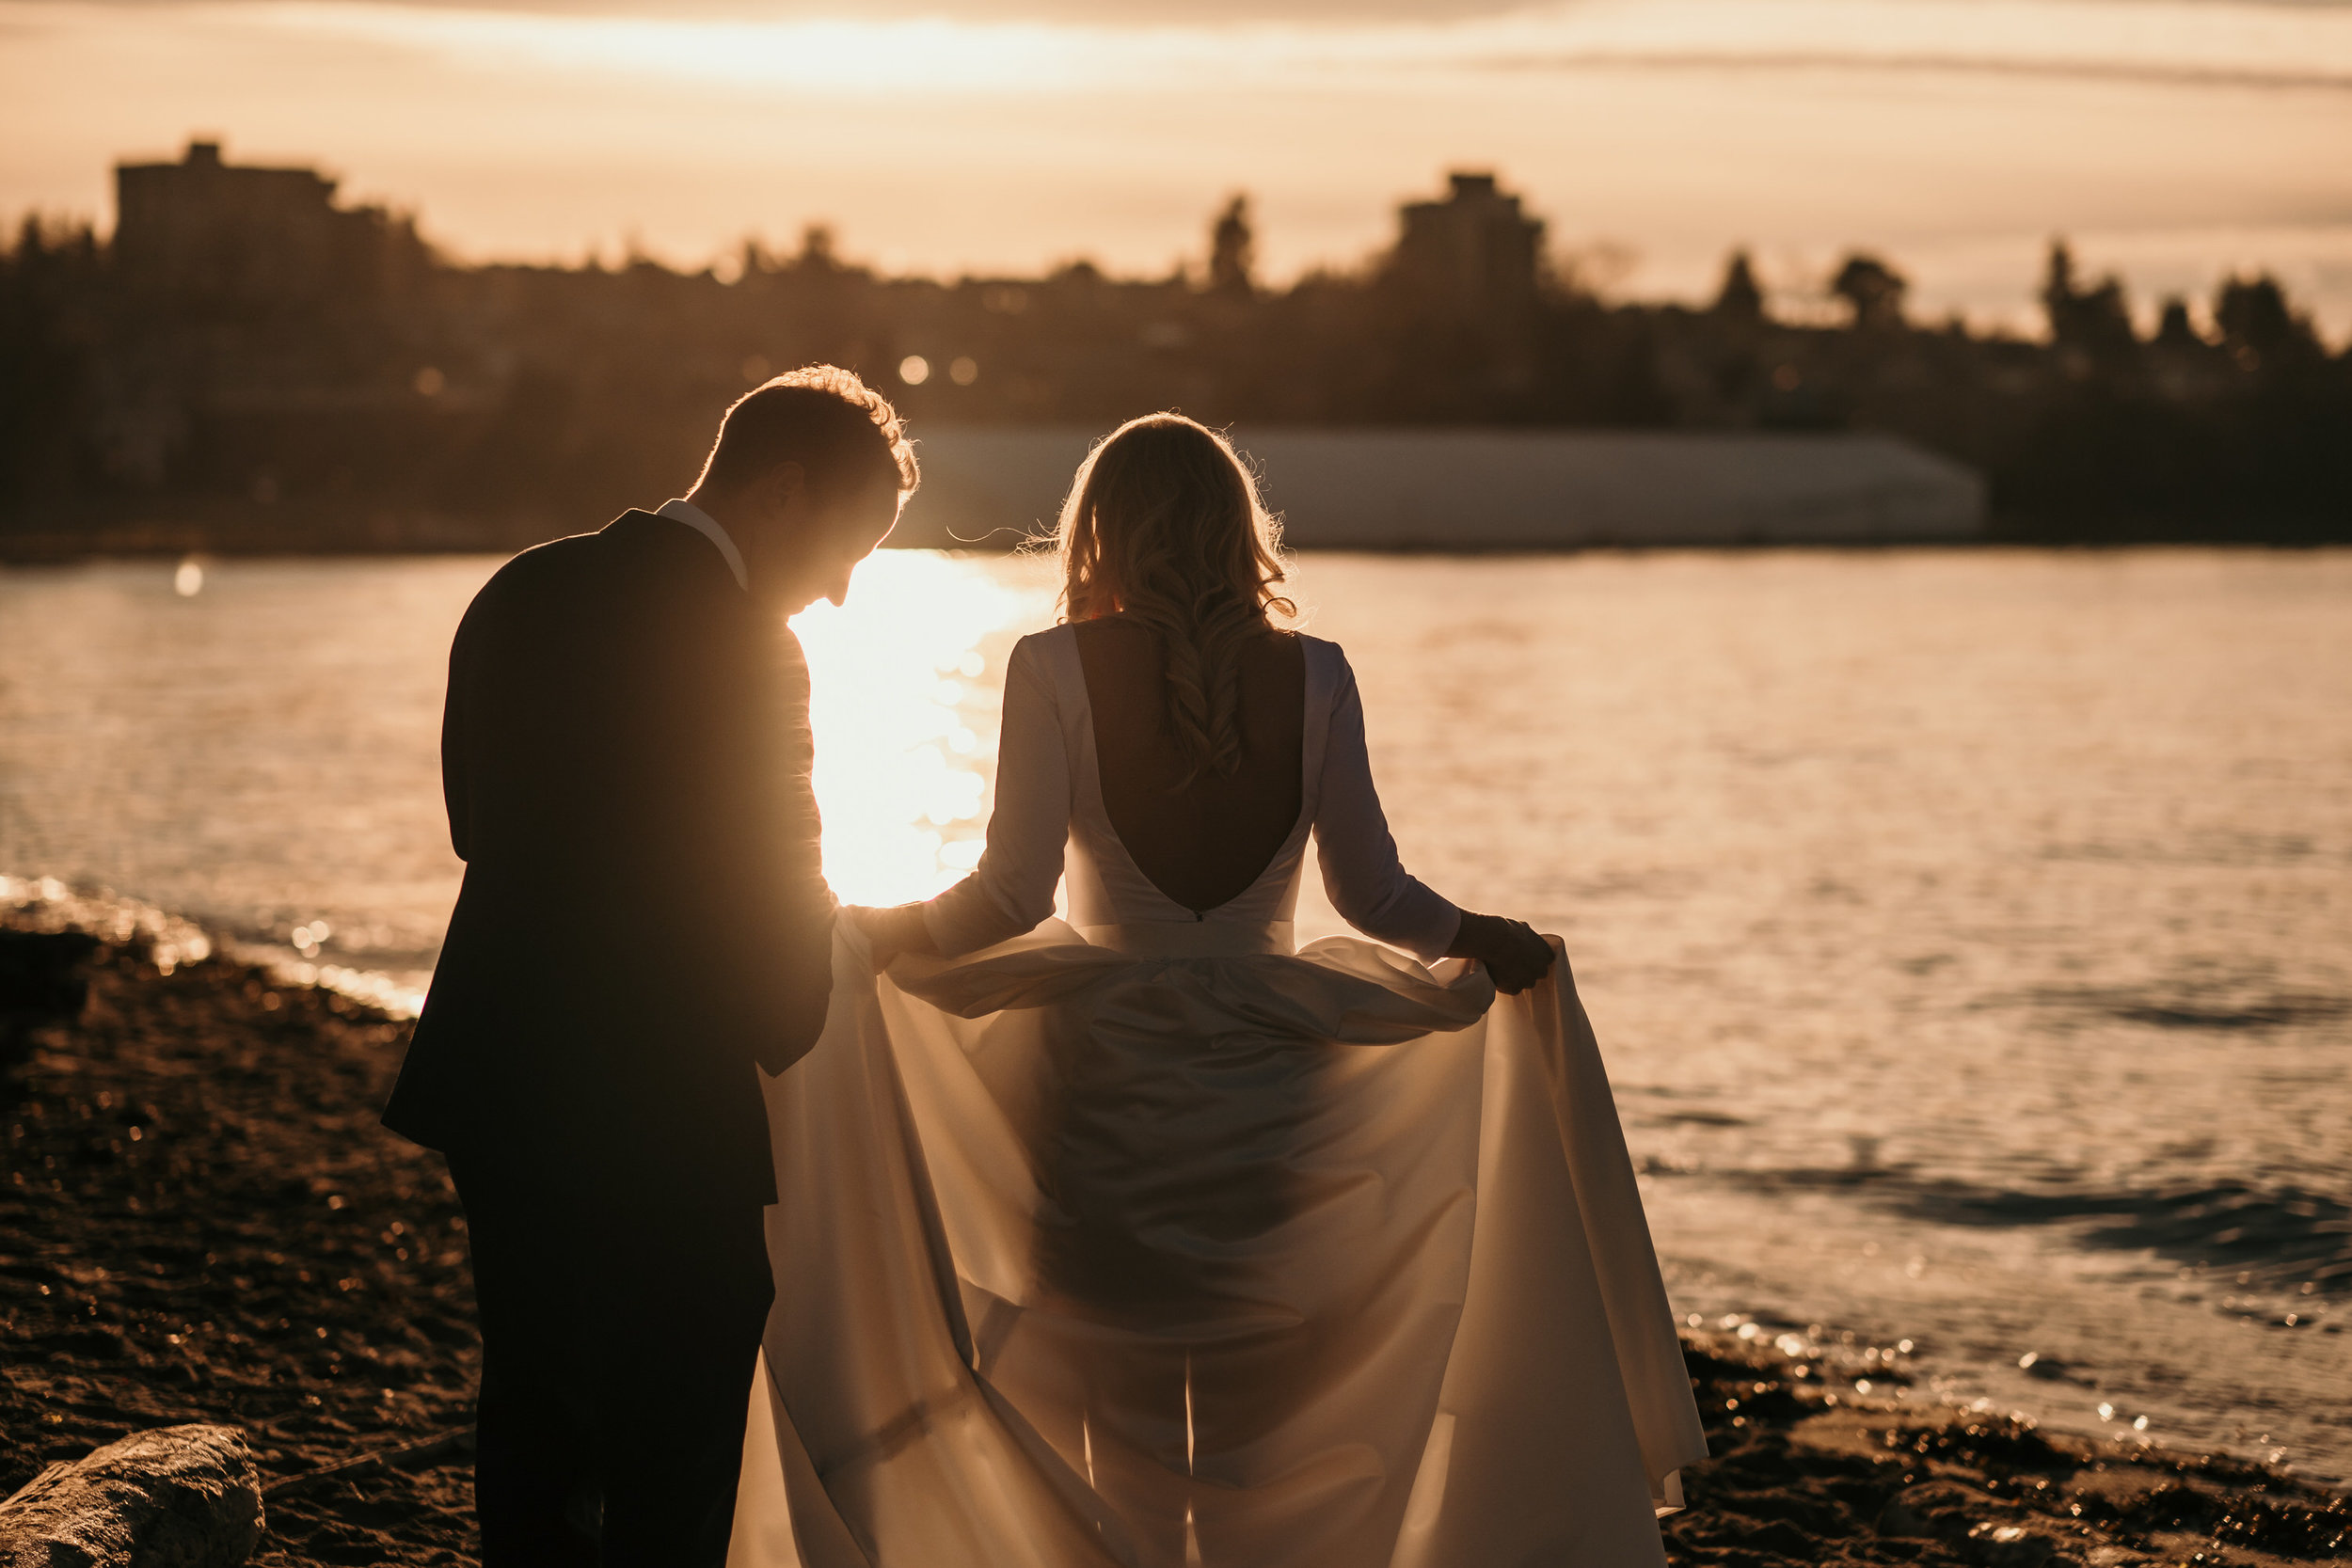 Vancouver Wedding Photos - Vegan Wedding Photographer - New Years Eve Wedding Photos - Vancouver Wedding Photographer - Vancouver Wedding Videographer - 754.JPG